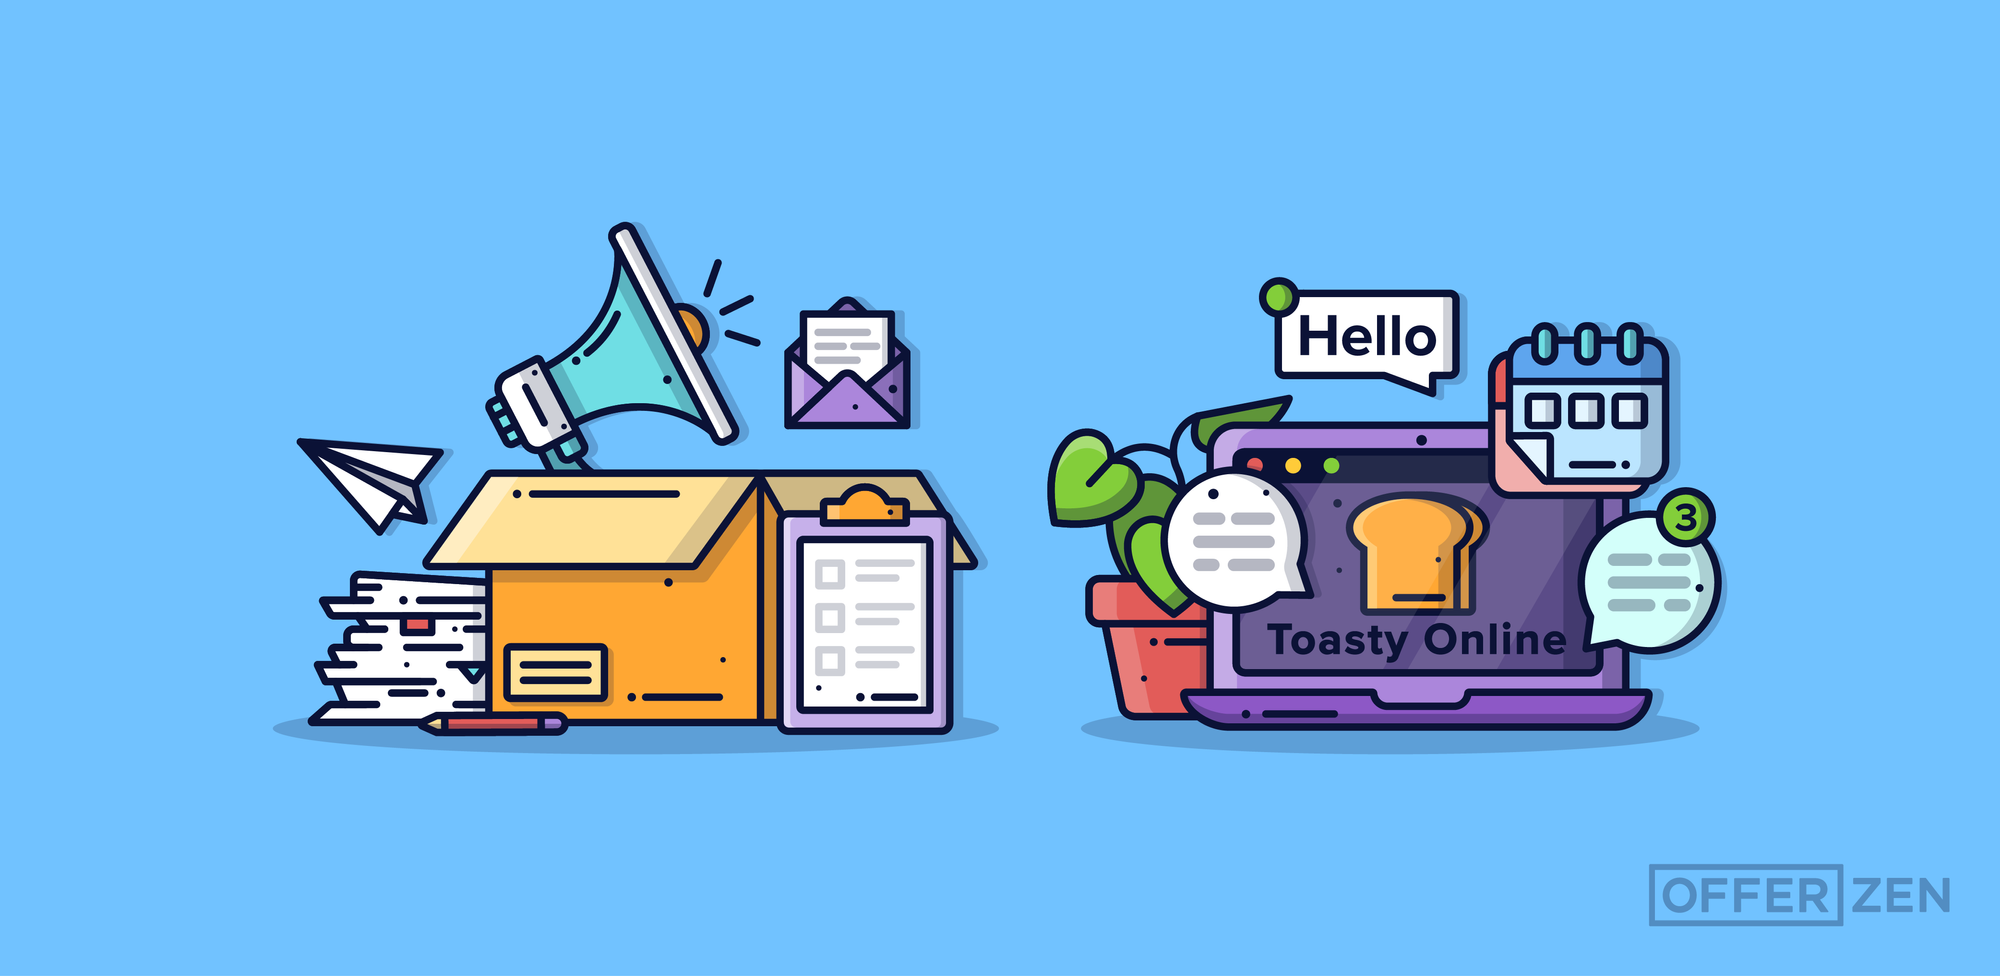 Kevon_Laptop_How-Prioritising-Tasks-Helped-Toasty-Go-Fully-Online-in-4-Weeks_Inner-Article-Image